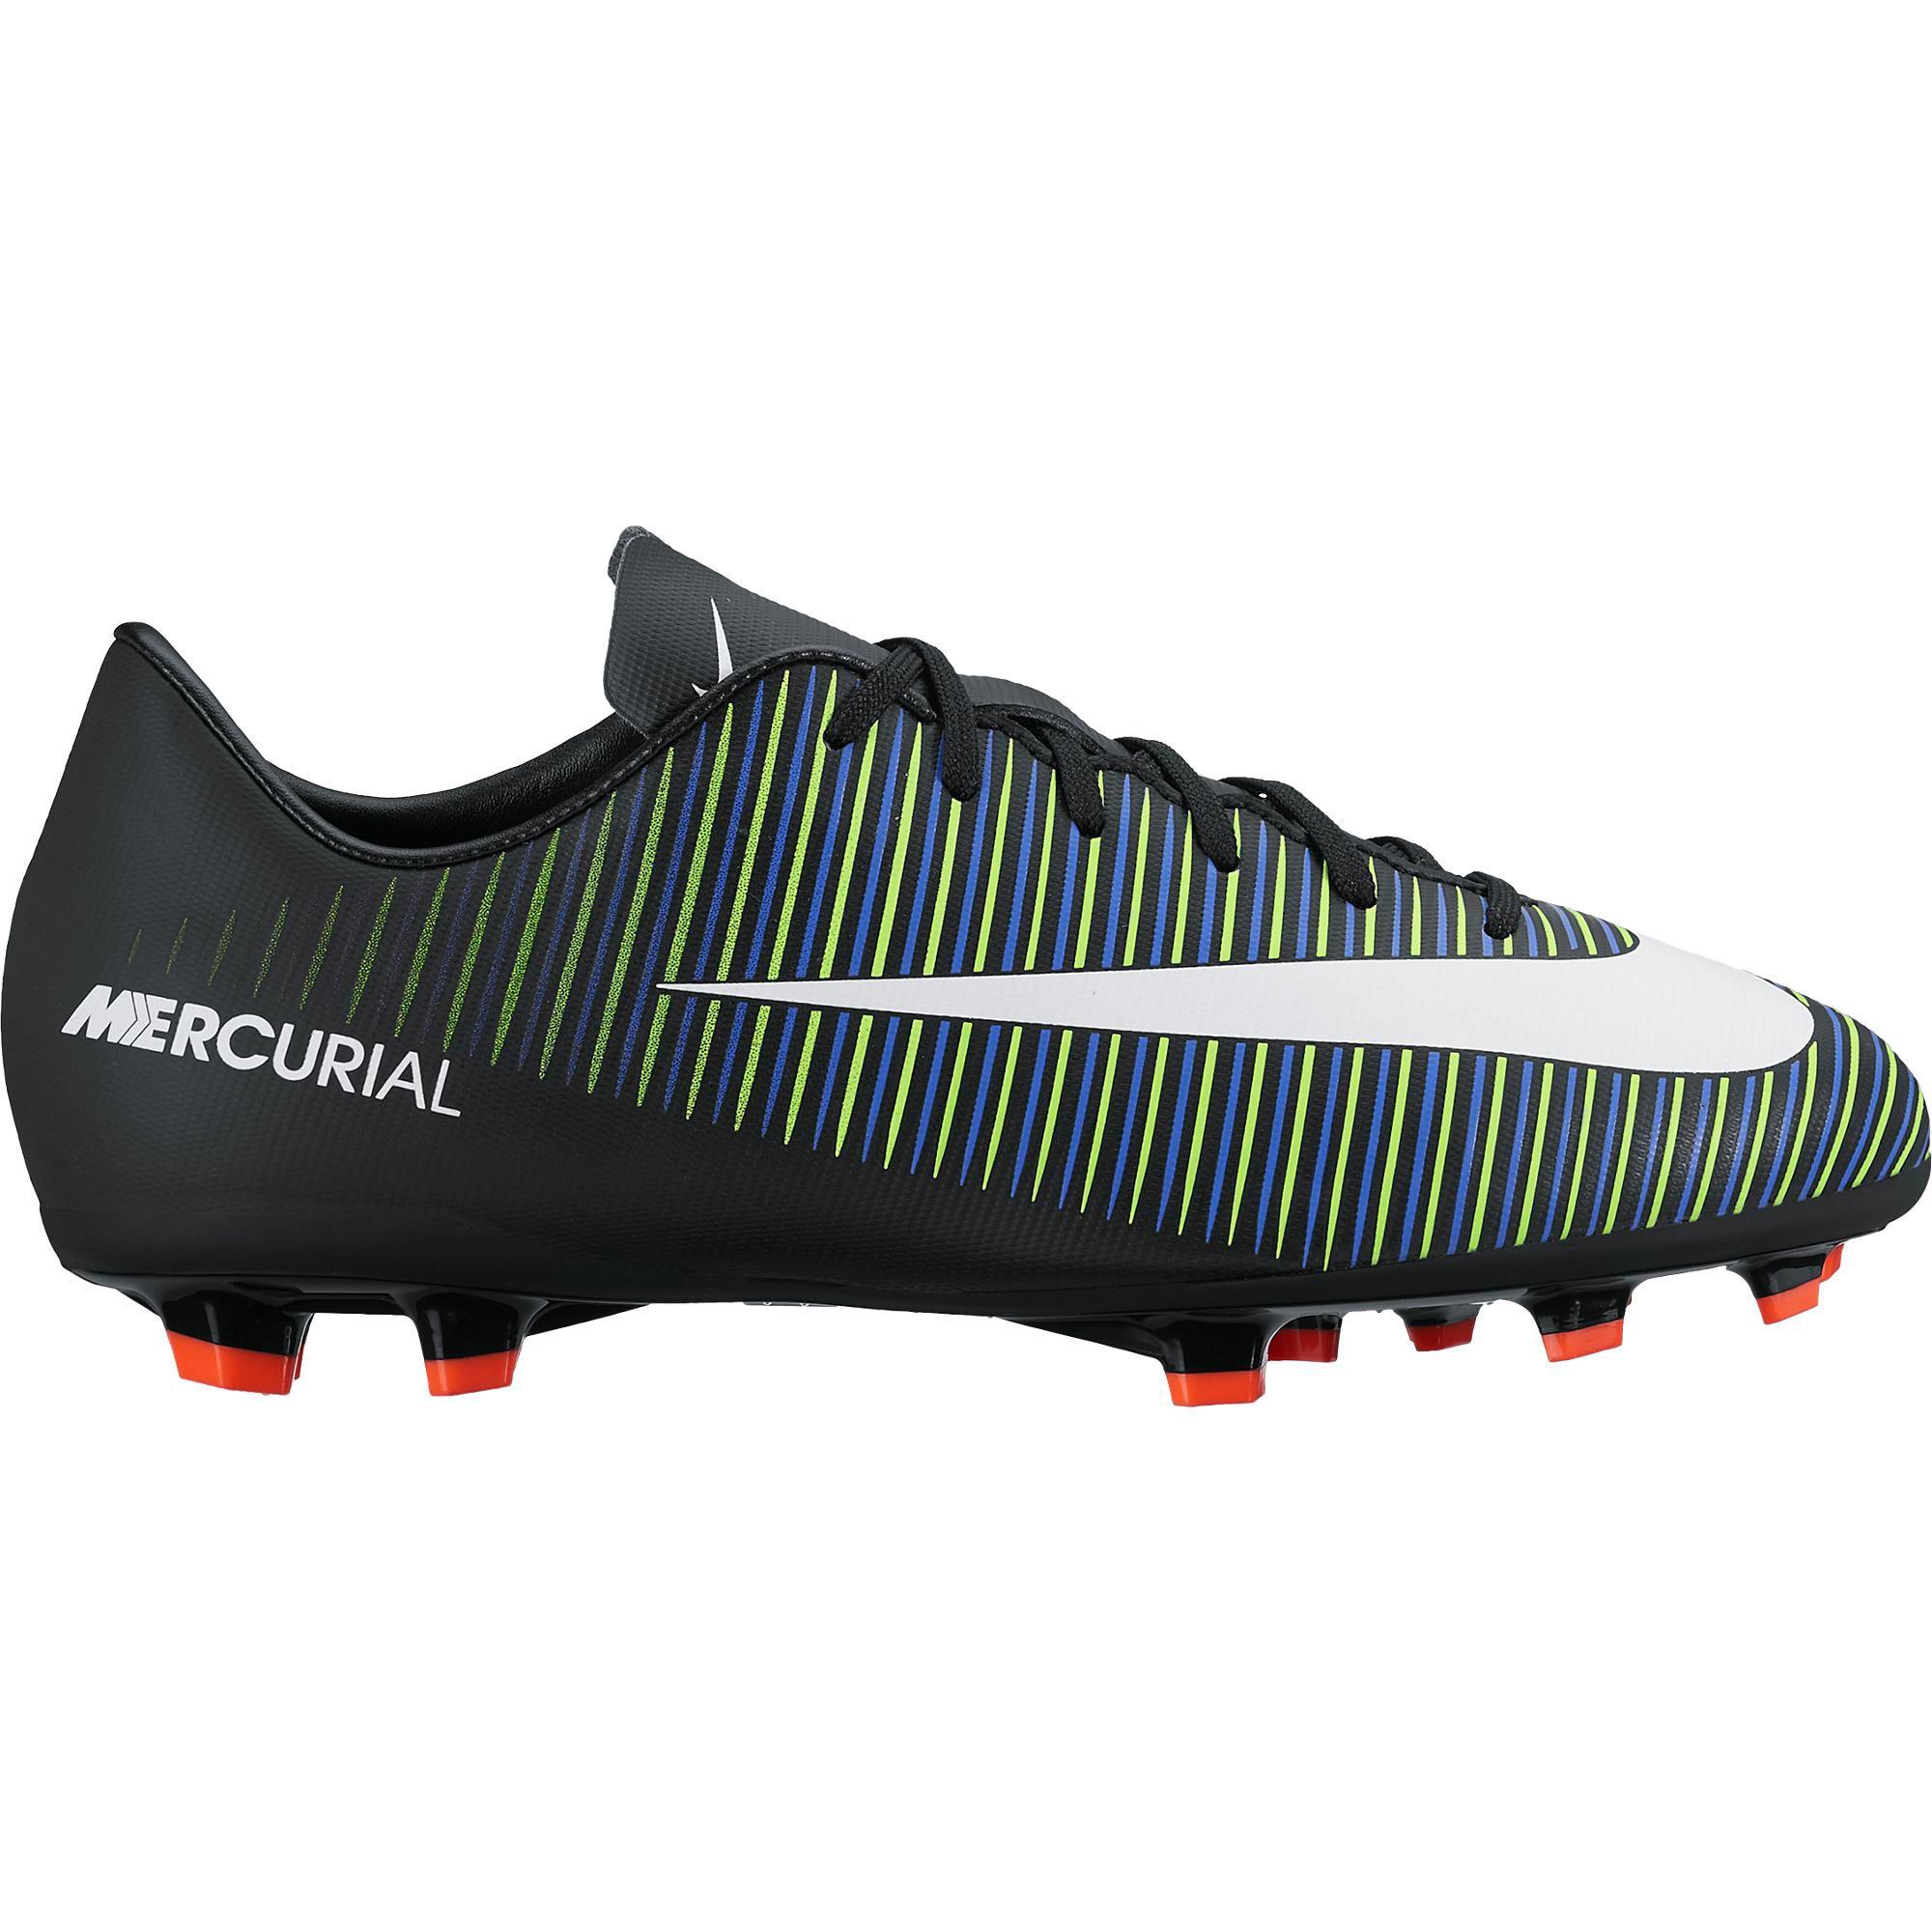 Nike Mercurial Vapor XI FG Black/White/Elect